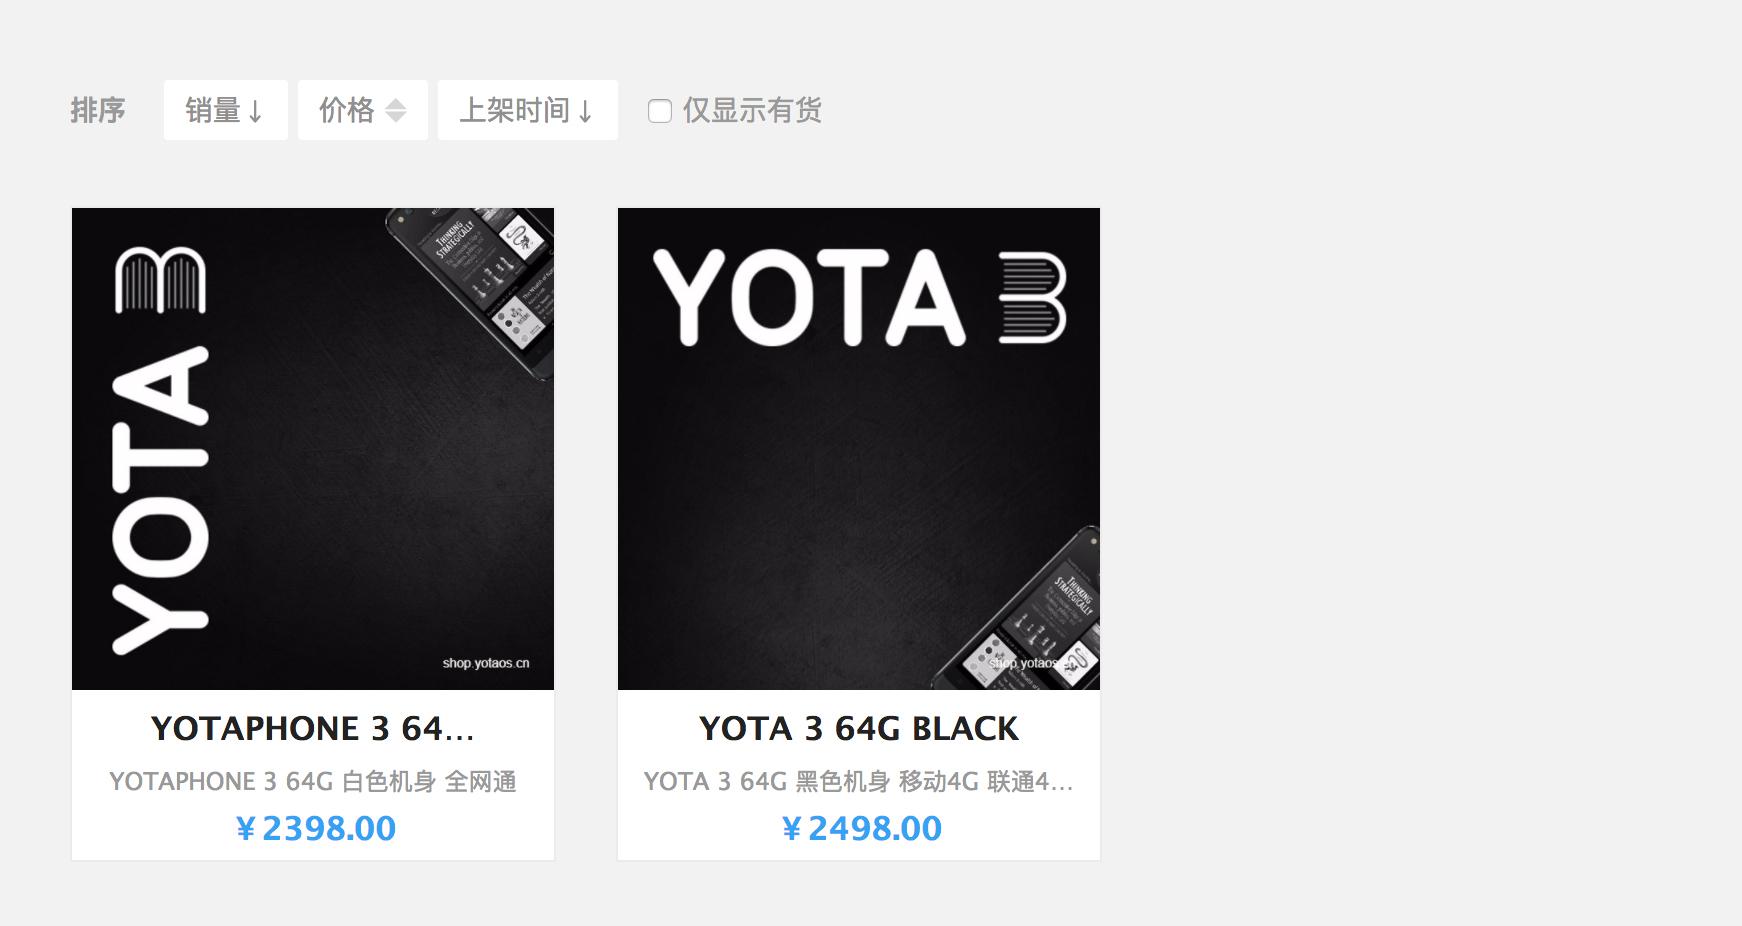 Рассекречены цены наYotaPhone 3